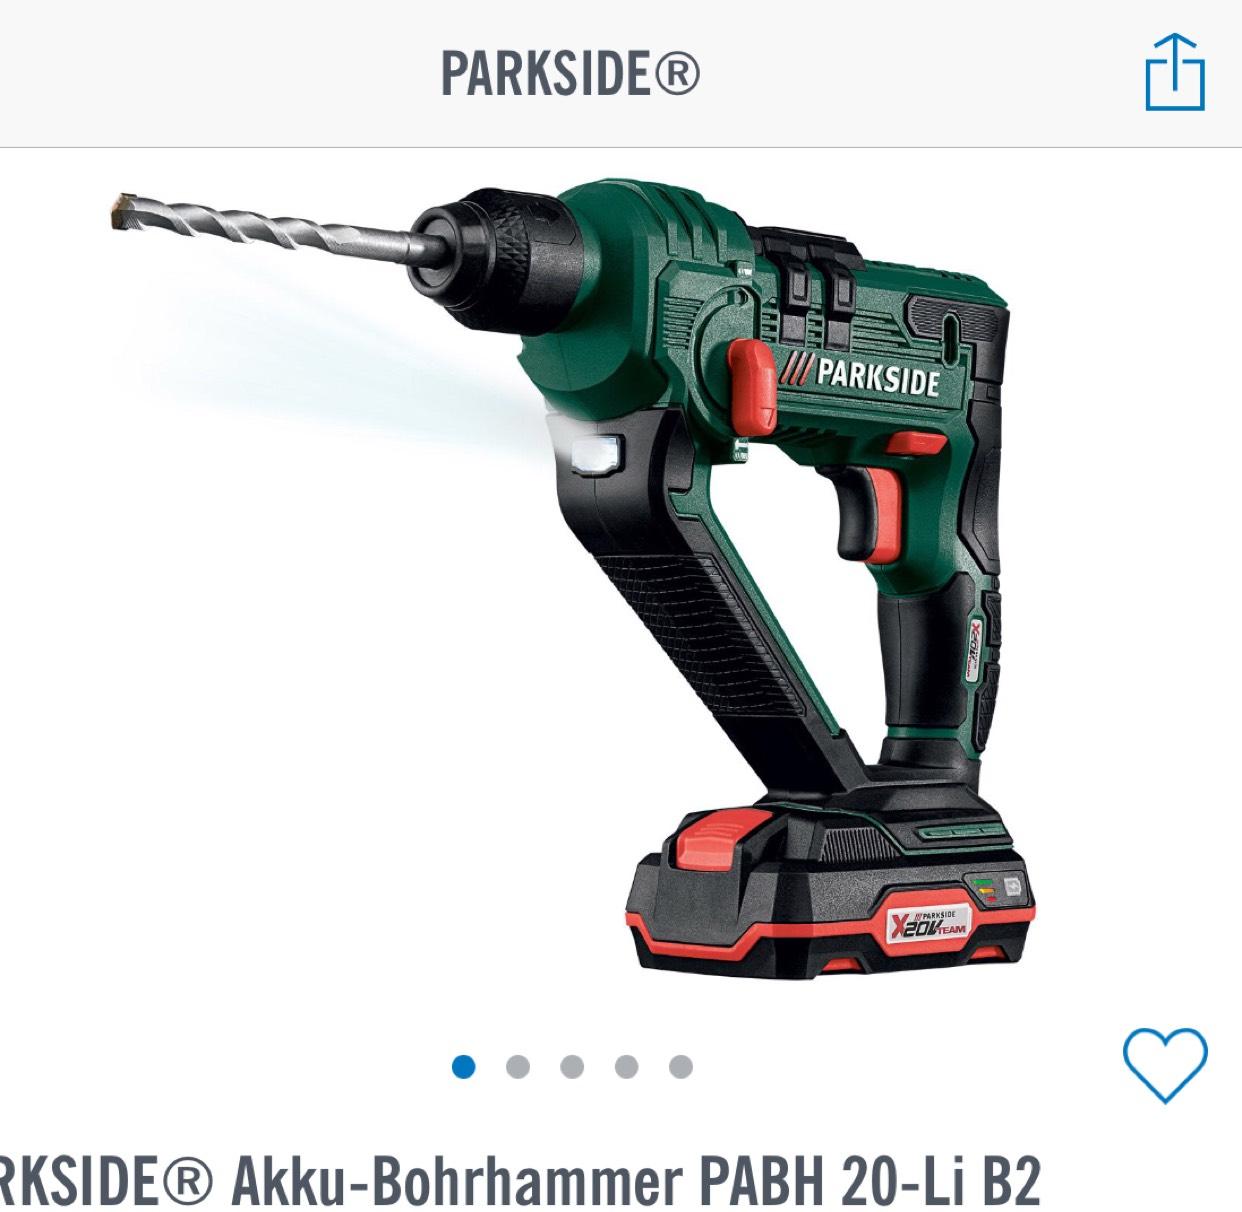 Lidl Crazy Deals PARKSIDE® Akku-Bohrhammer PABH 20-Li B2 mit Akku